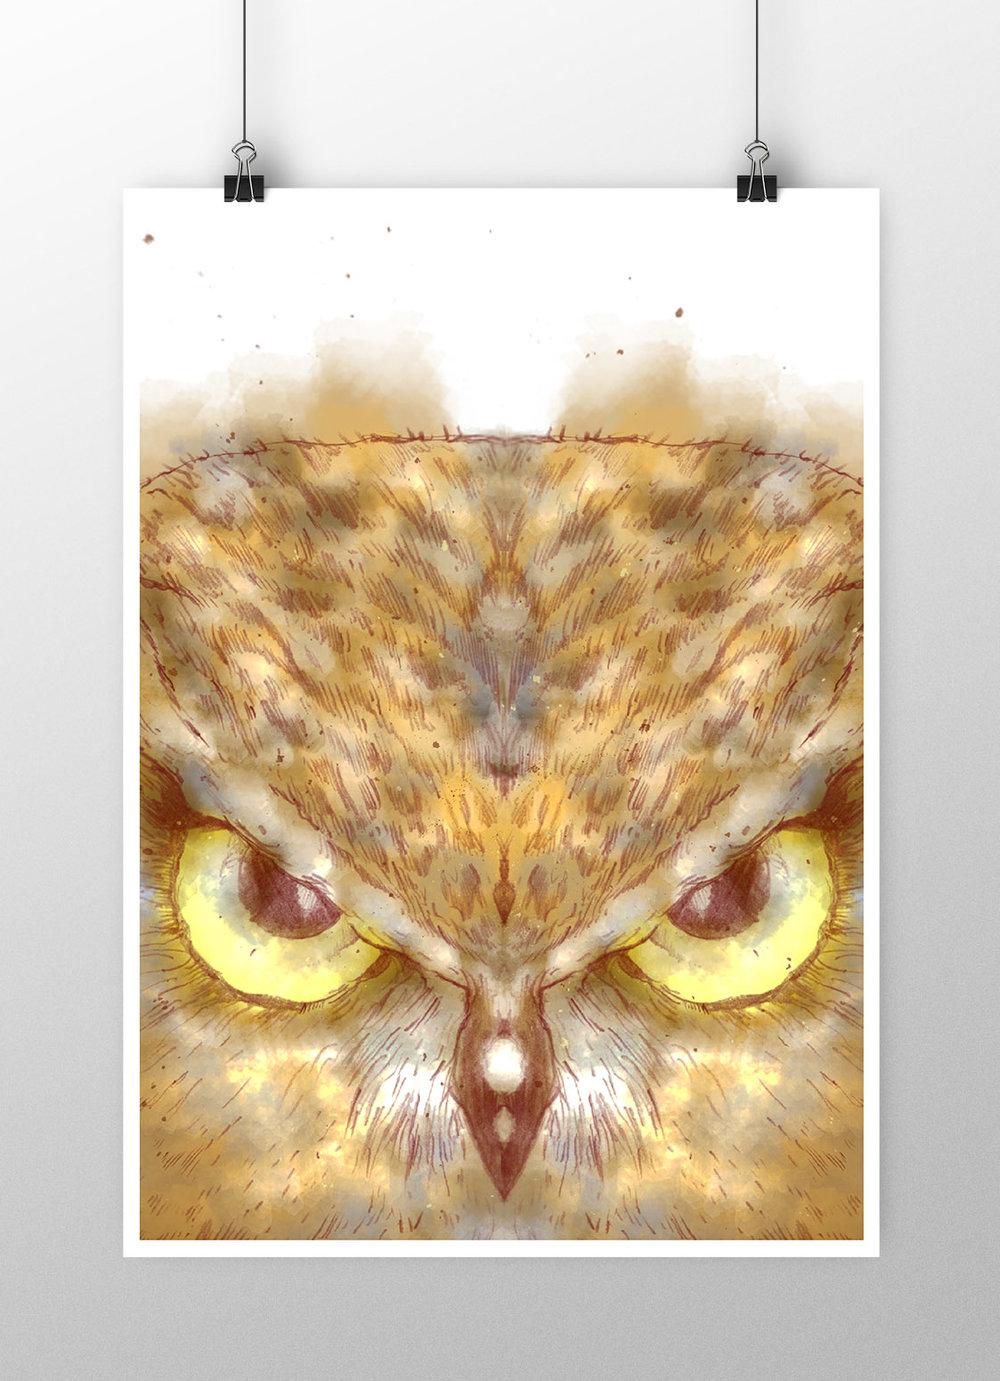 EAGLE EYES |A3 PRINT    MATT FINISH ON 330G PAPER    SIGNED BY ARTIST    LTD RUN